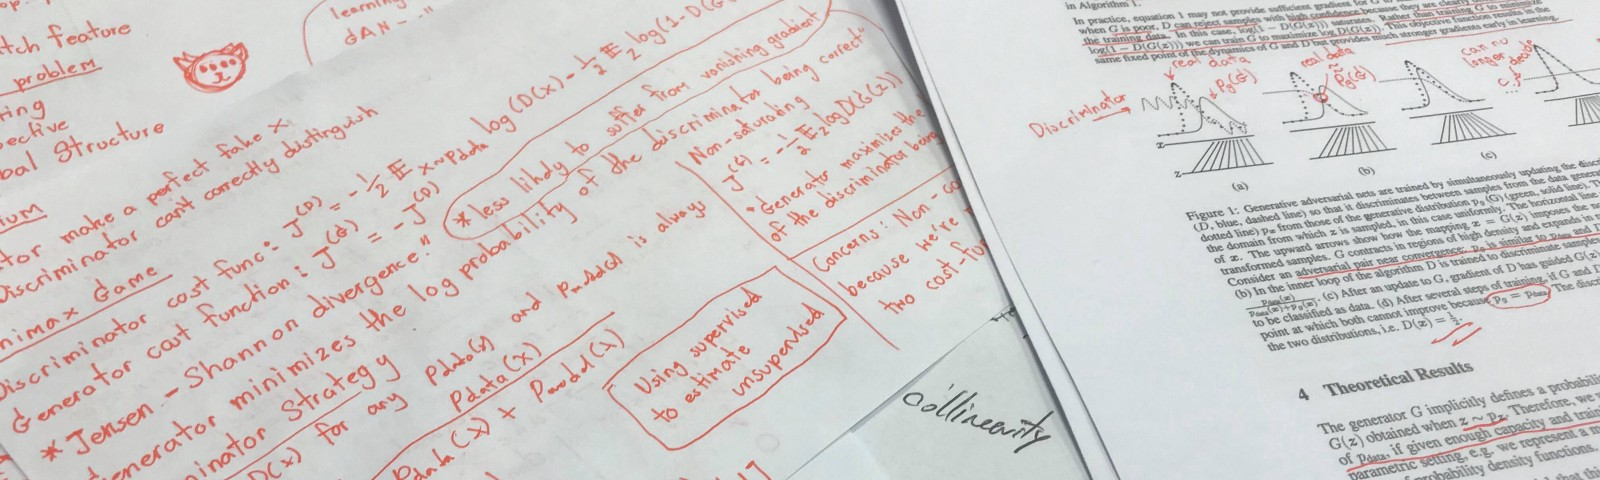 Summer Internships \u2013 Data Wow Blog - Intelligent Outsourcing